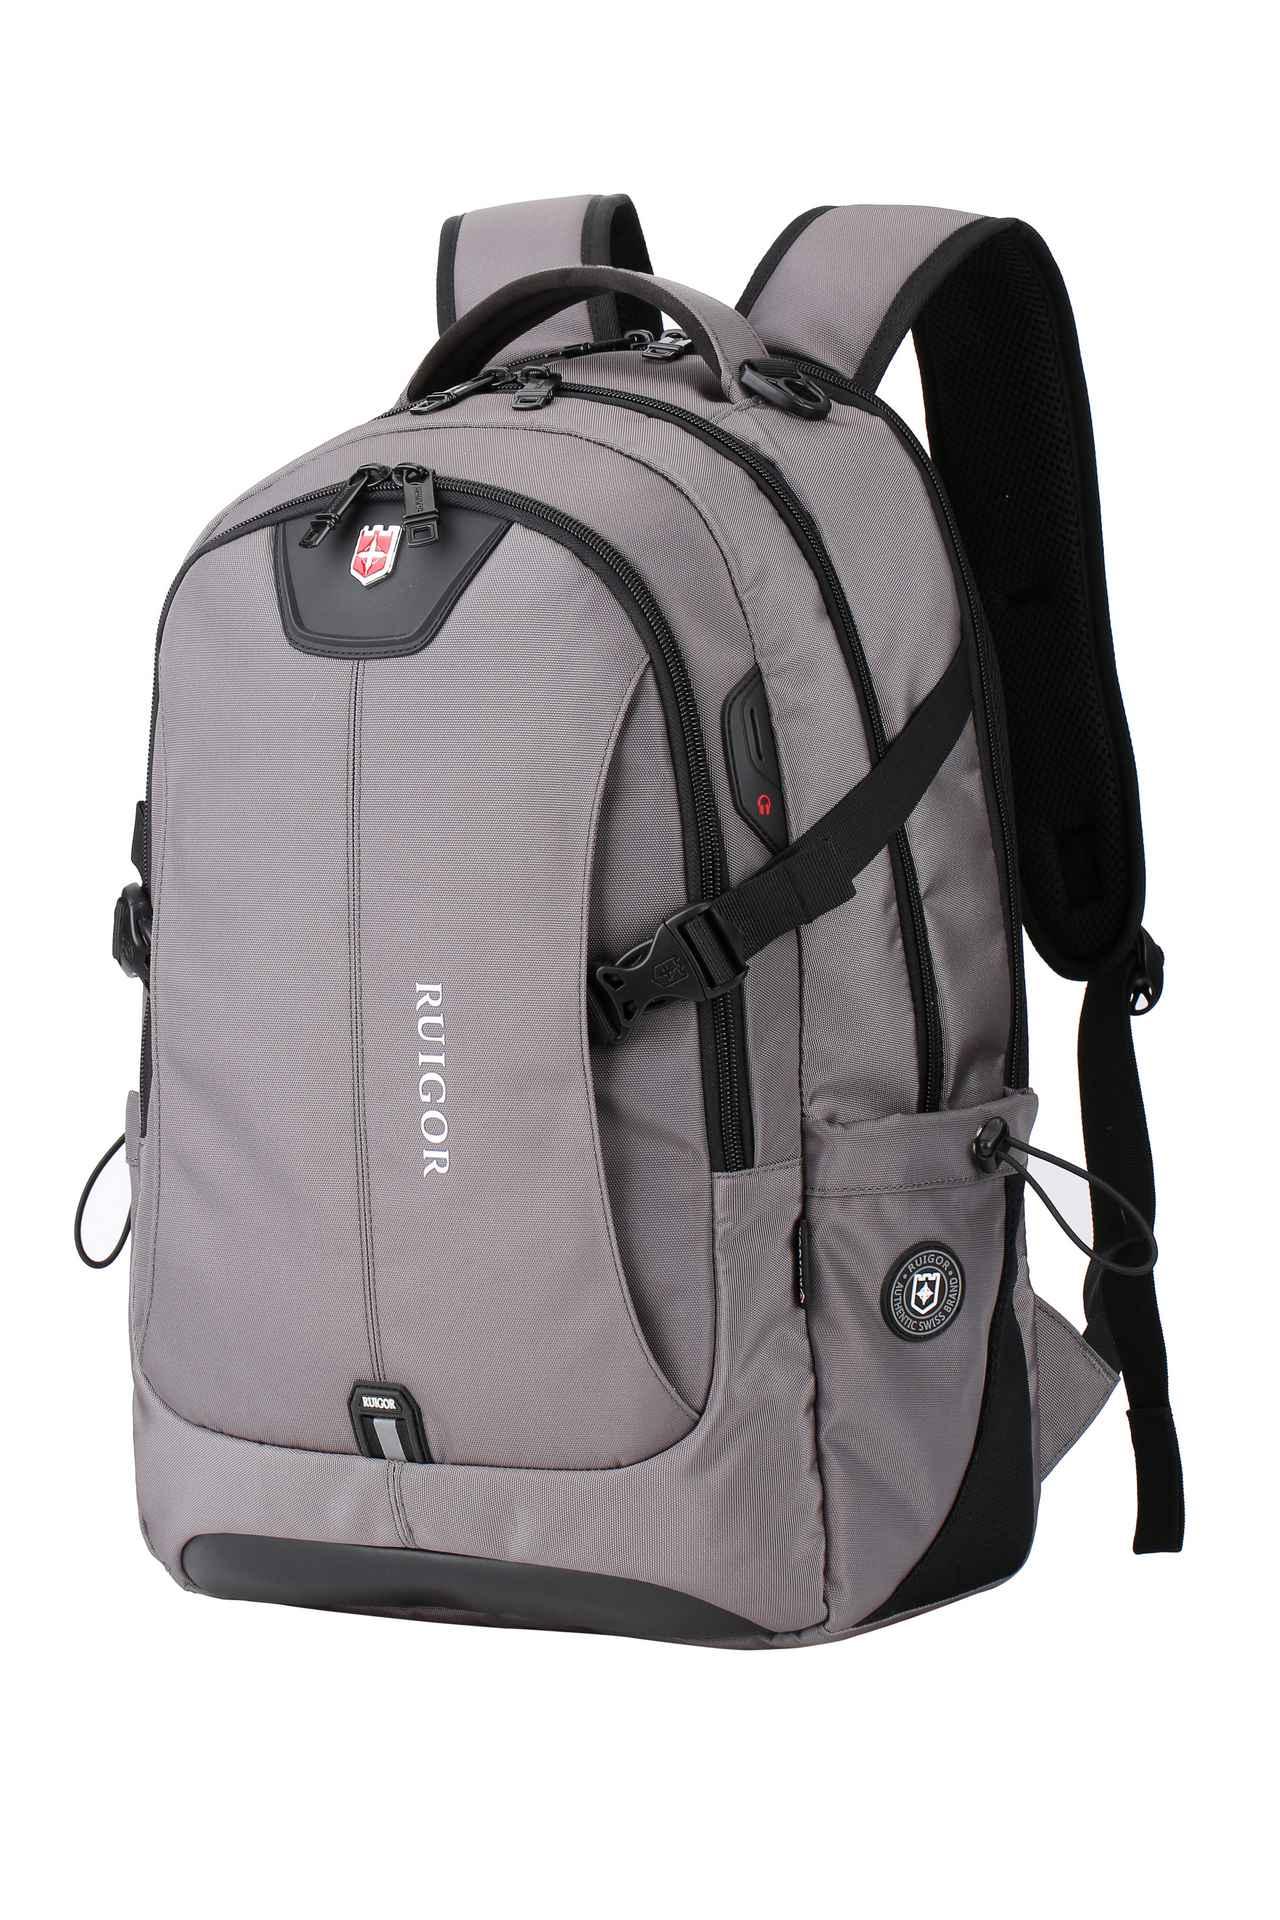 RUIGOR ICON  47 Laptop Backpack Grey